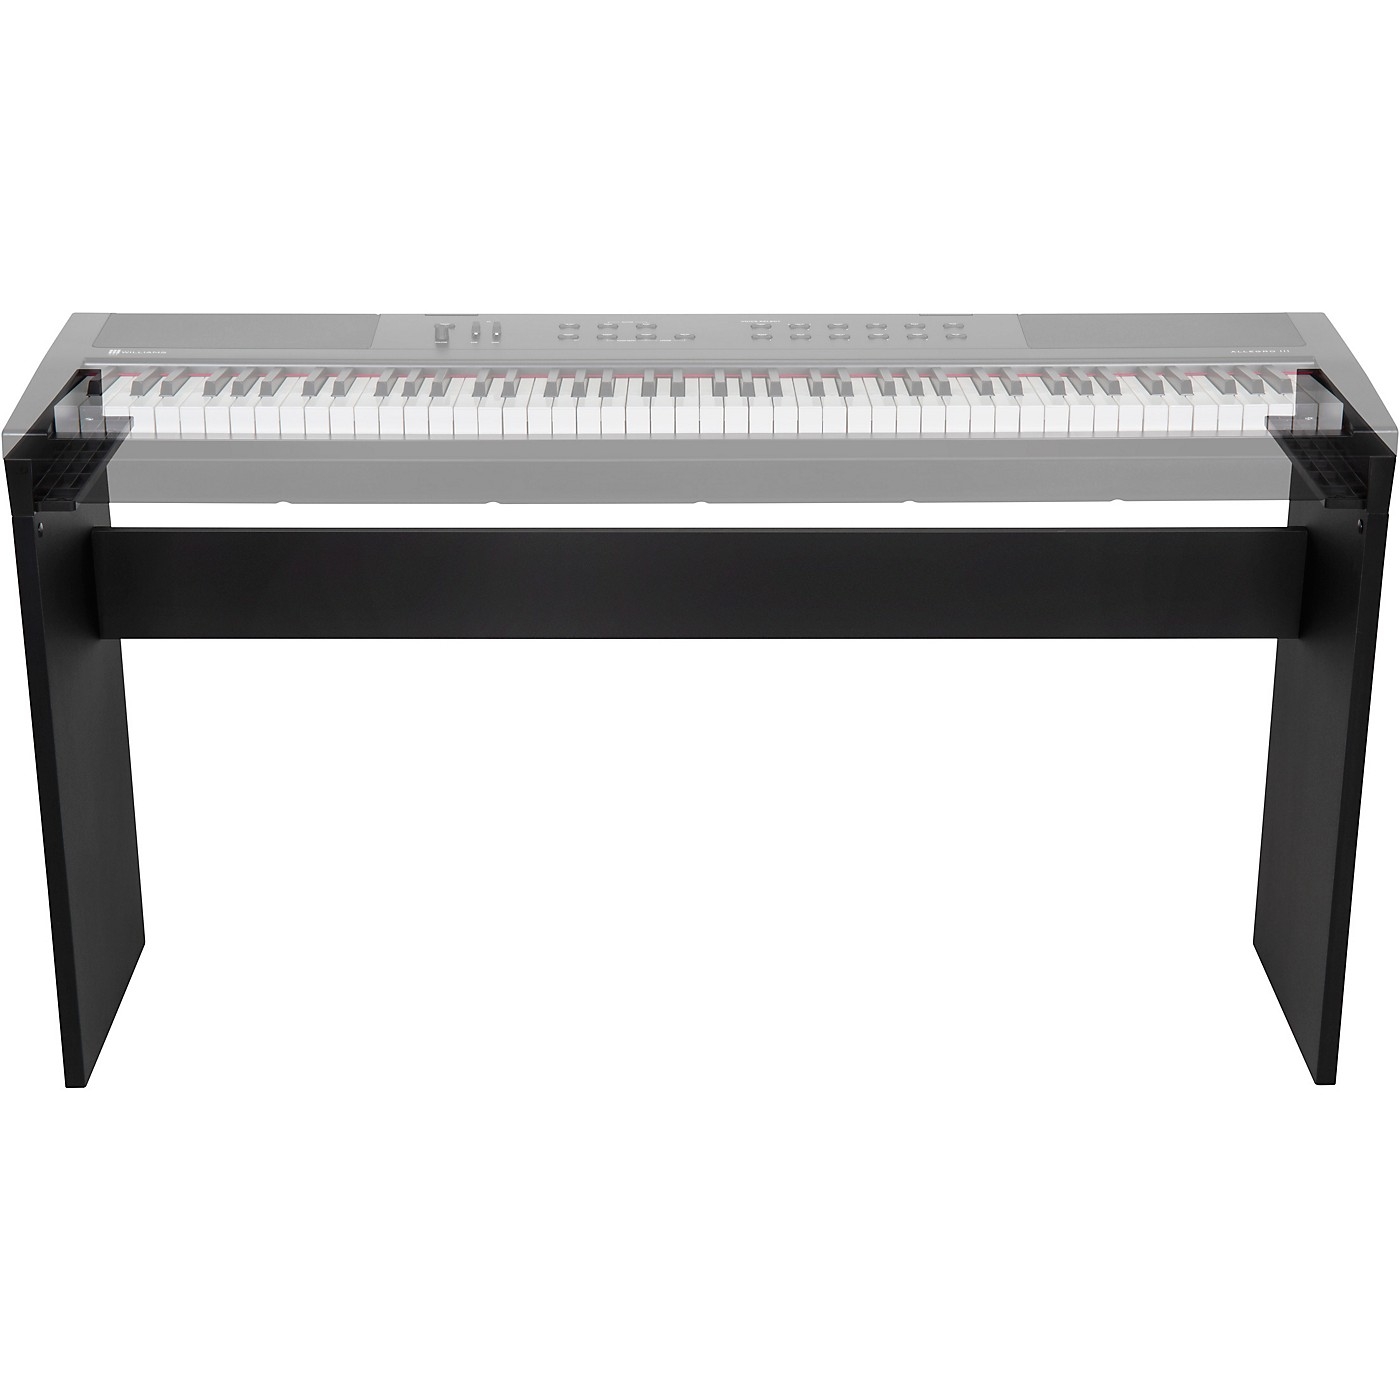 Williams Black Stand for Williams Allegro 2 Plus & Allegro lll Digital Piano thumbnail